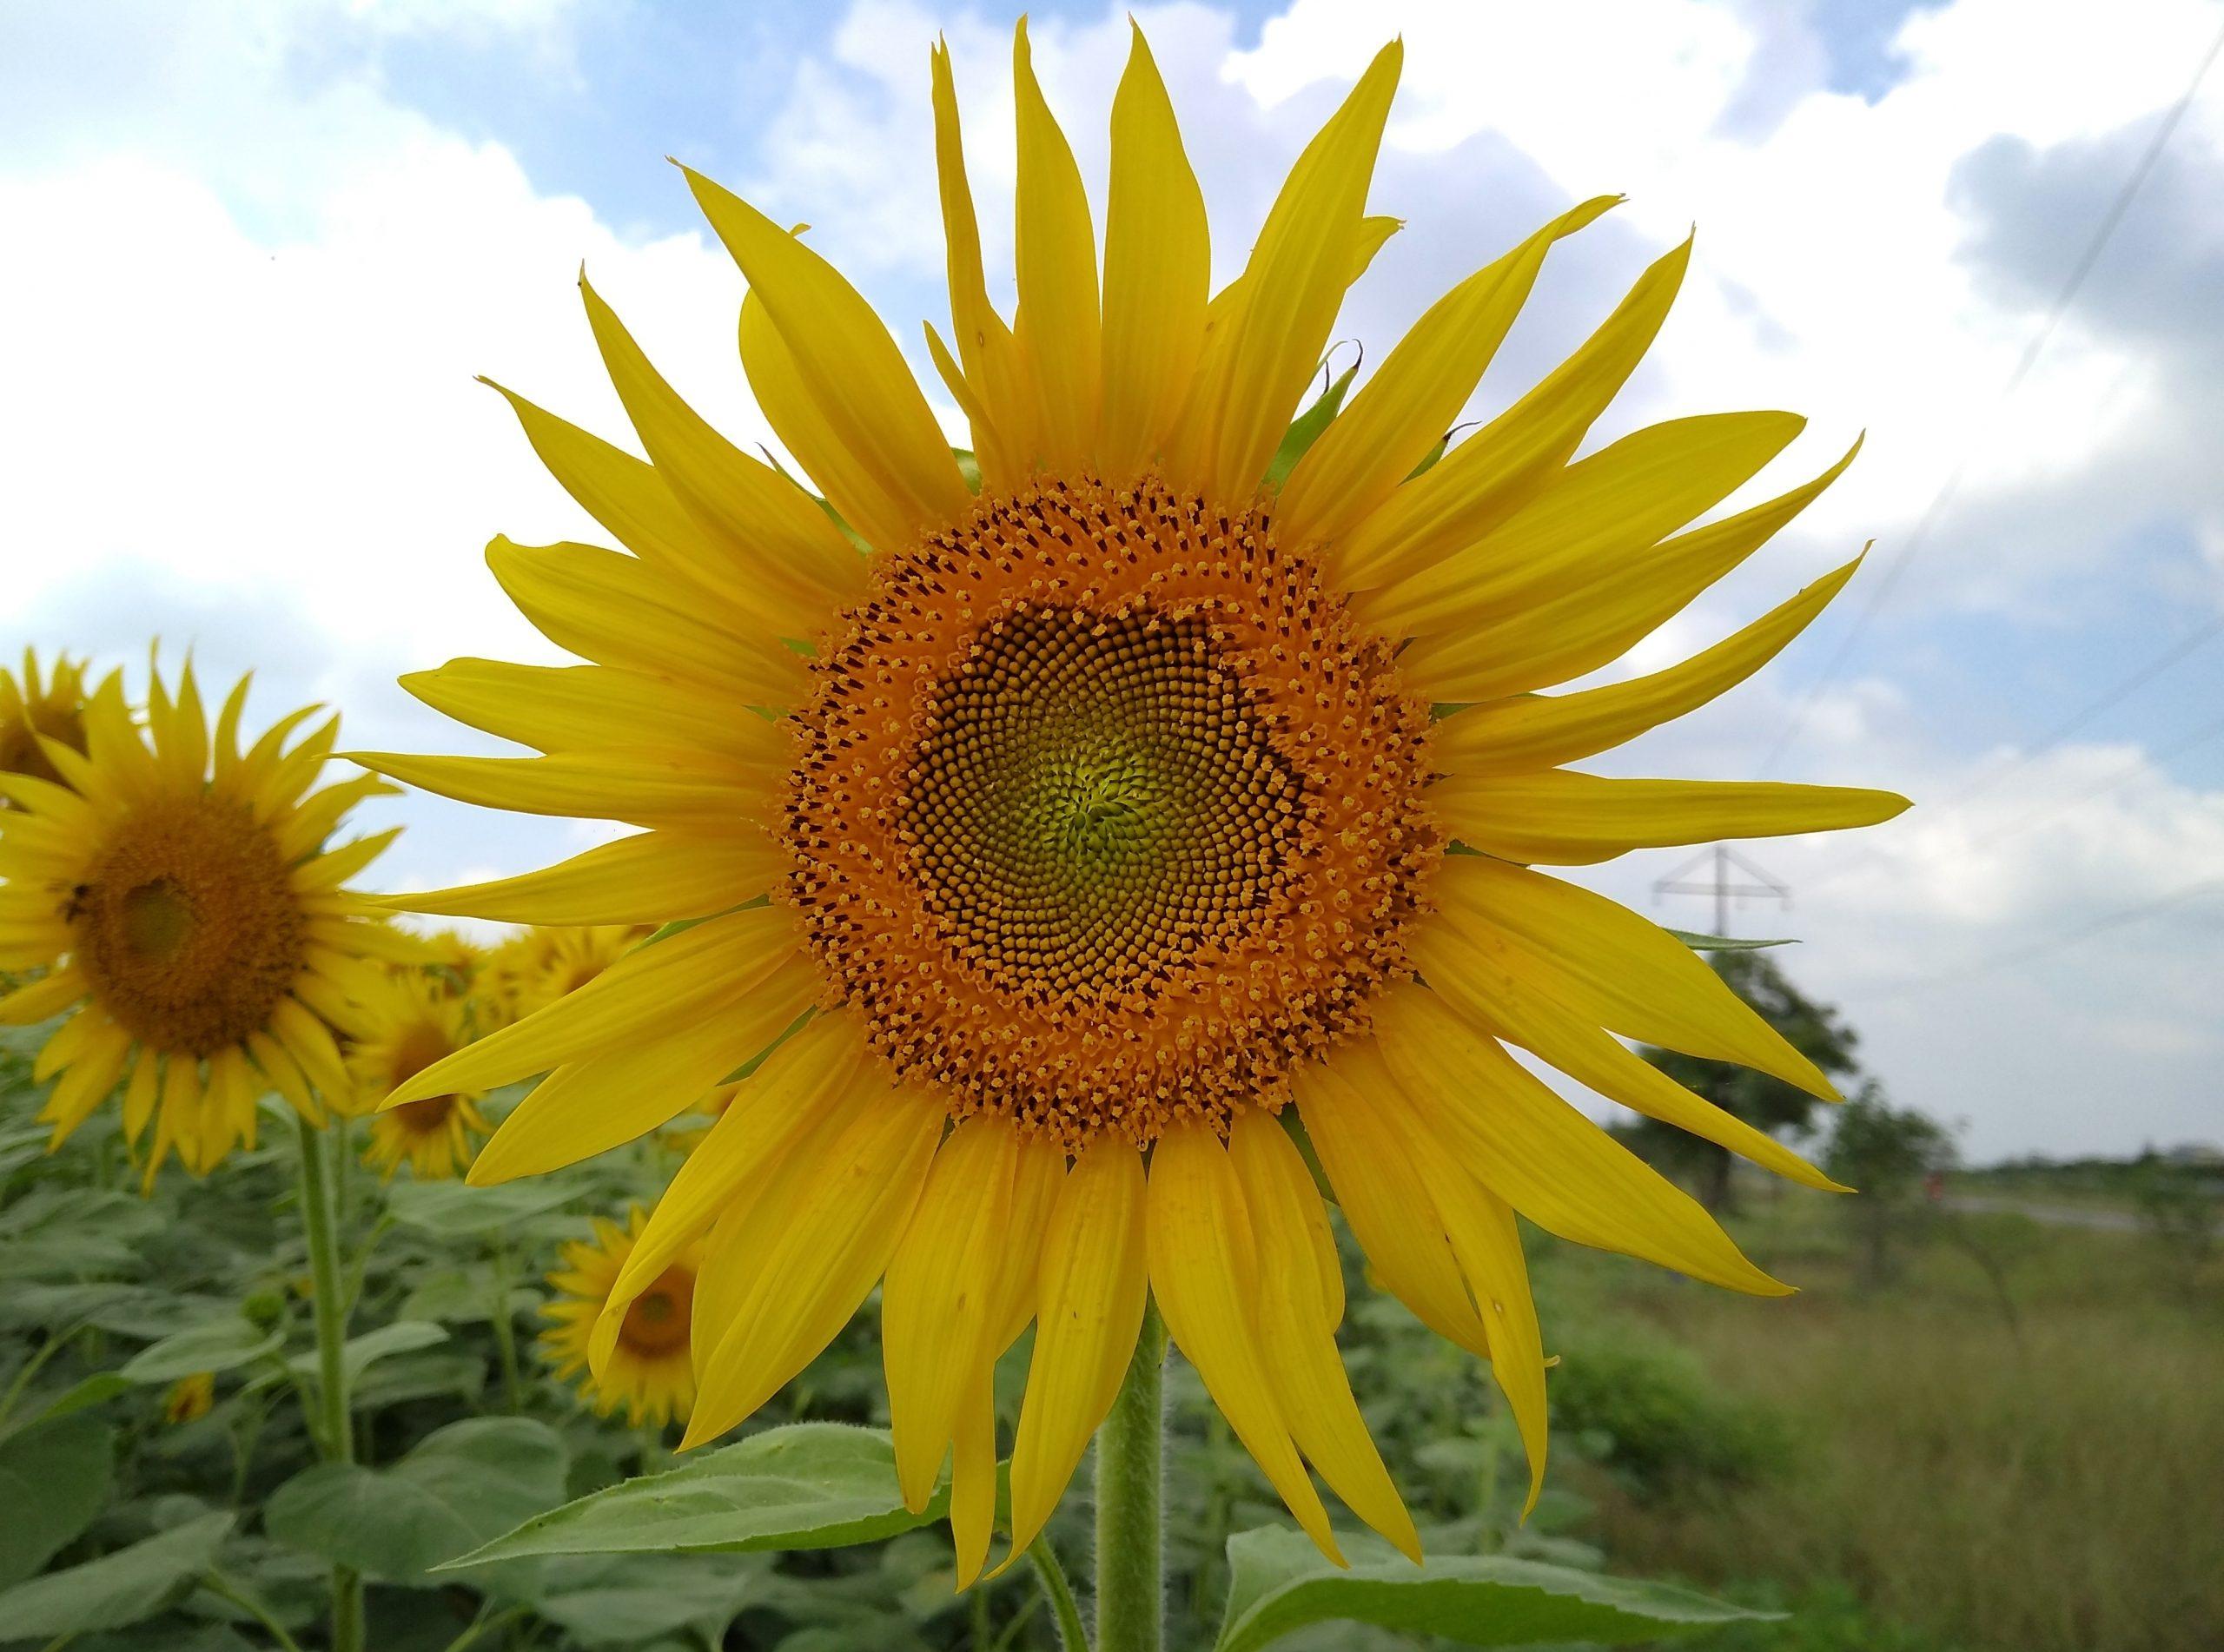 Sun Flower on Focus